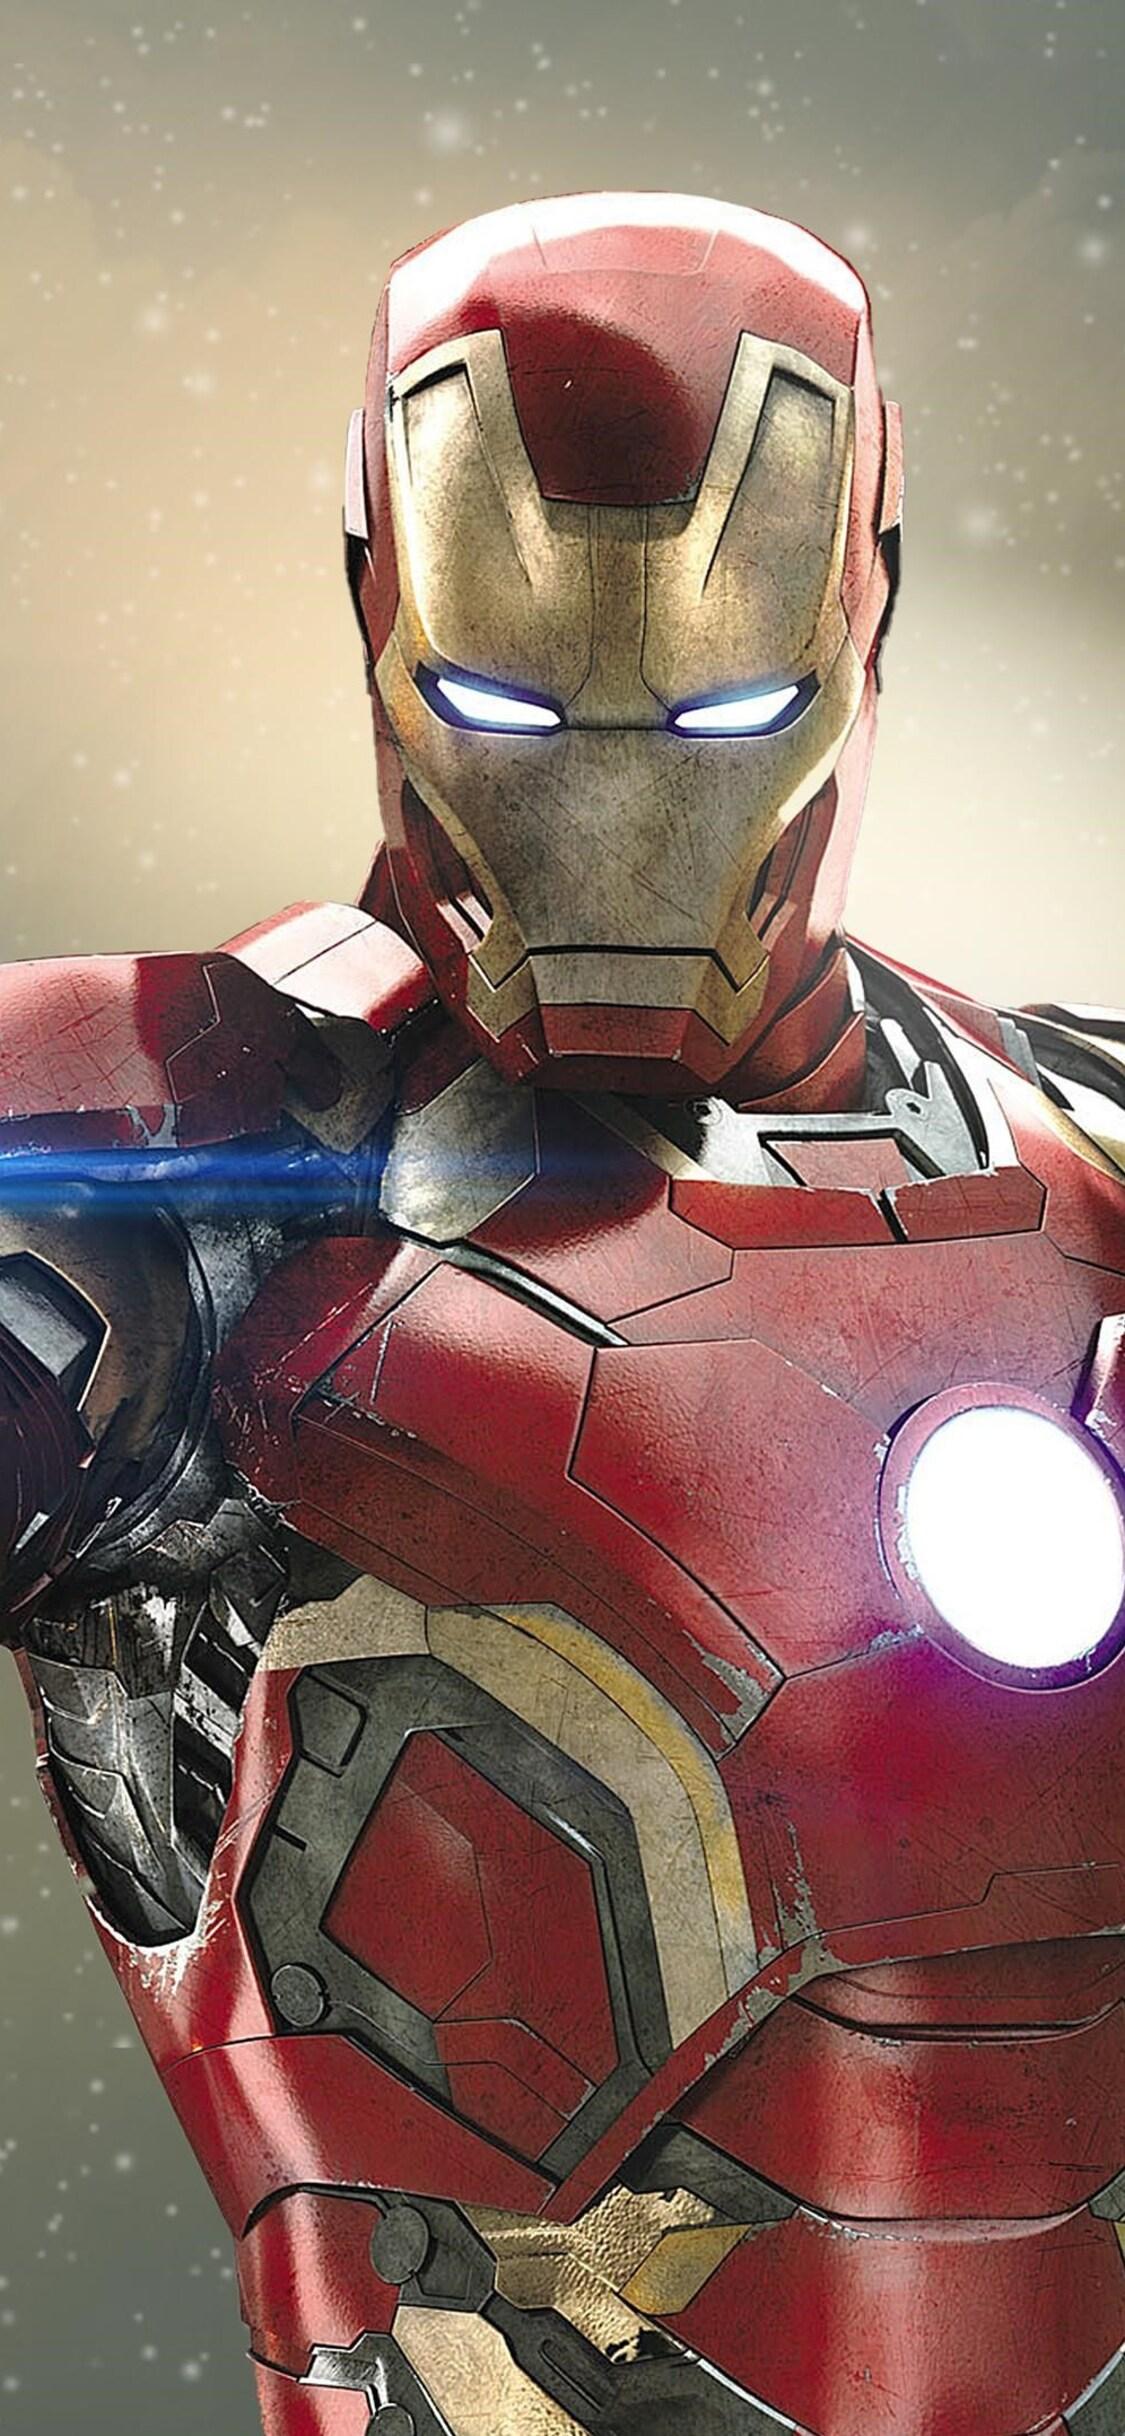 1125x2436 Iron Man 4k Iphone Xs Iphone 10 Iphone X Hd 4k Wallpapers